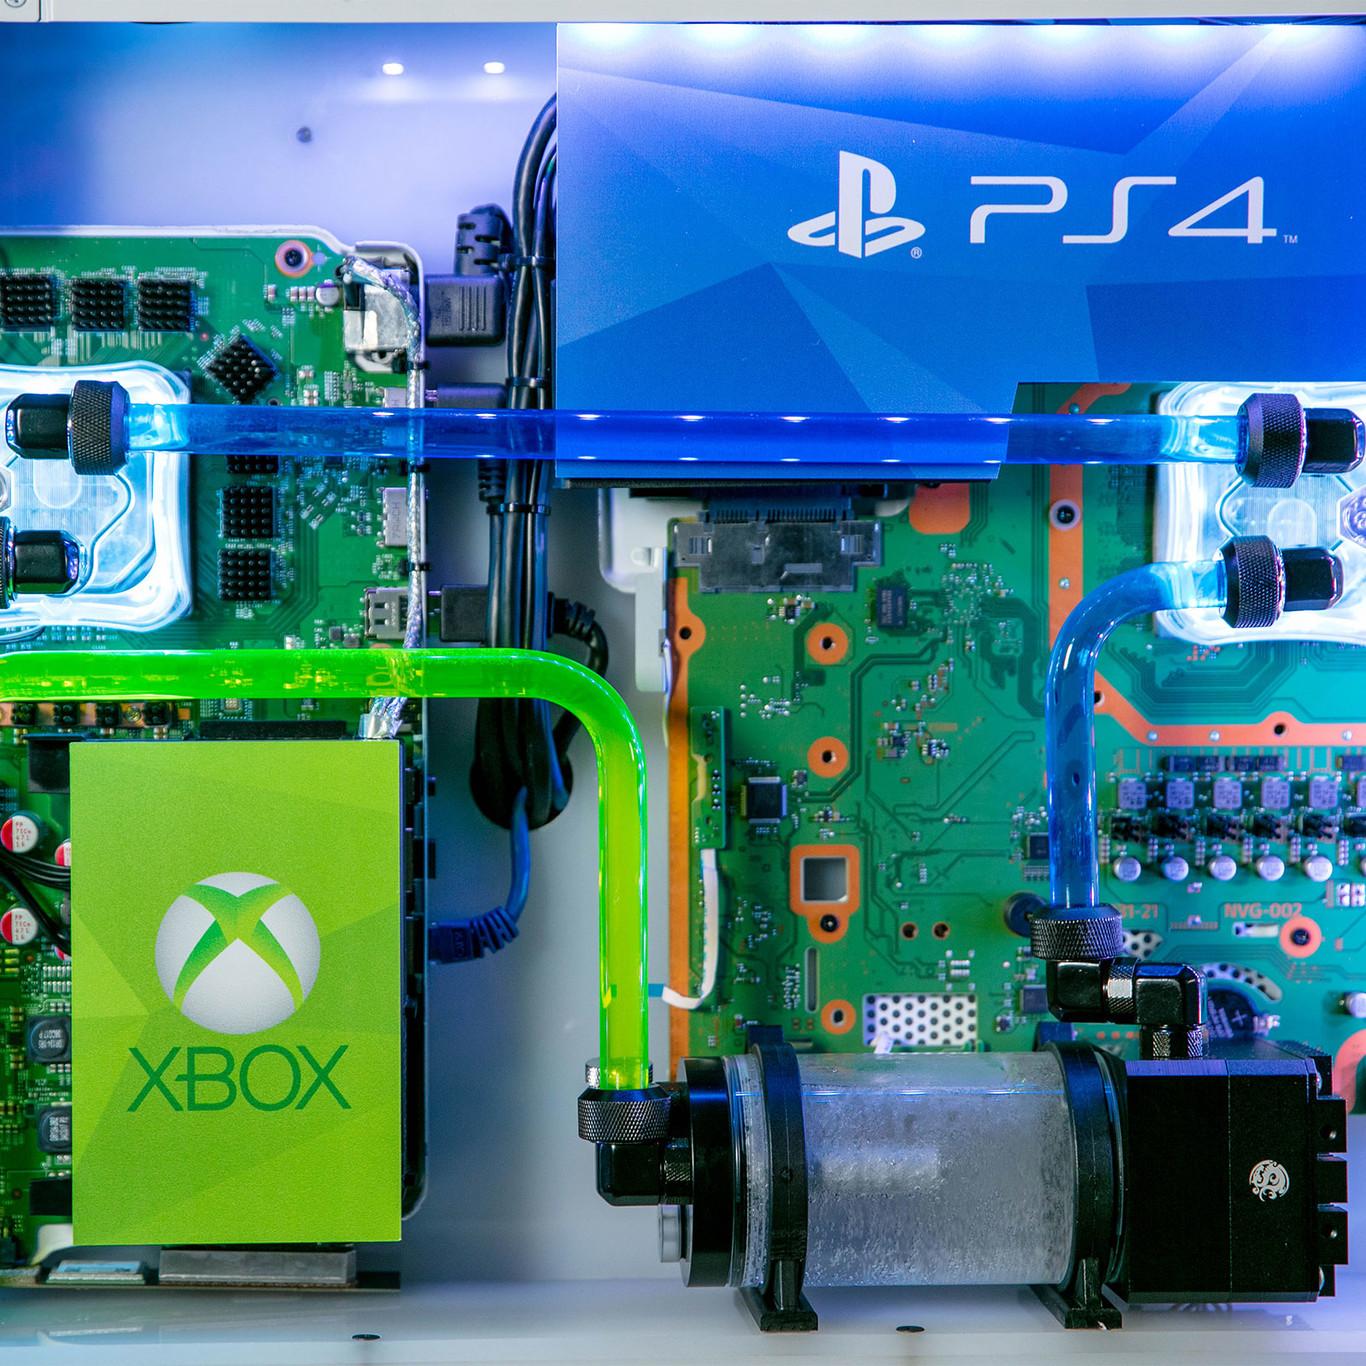 PS4 Xbox switch PC